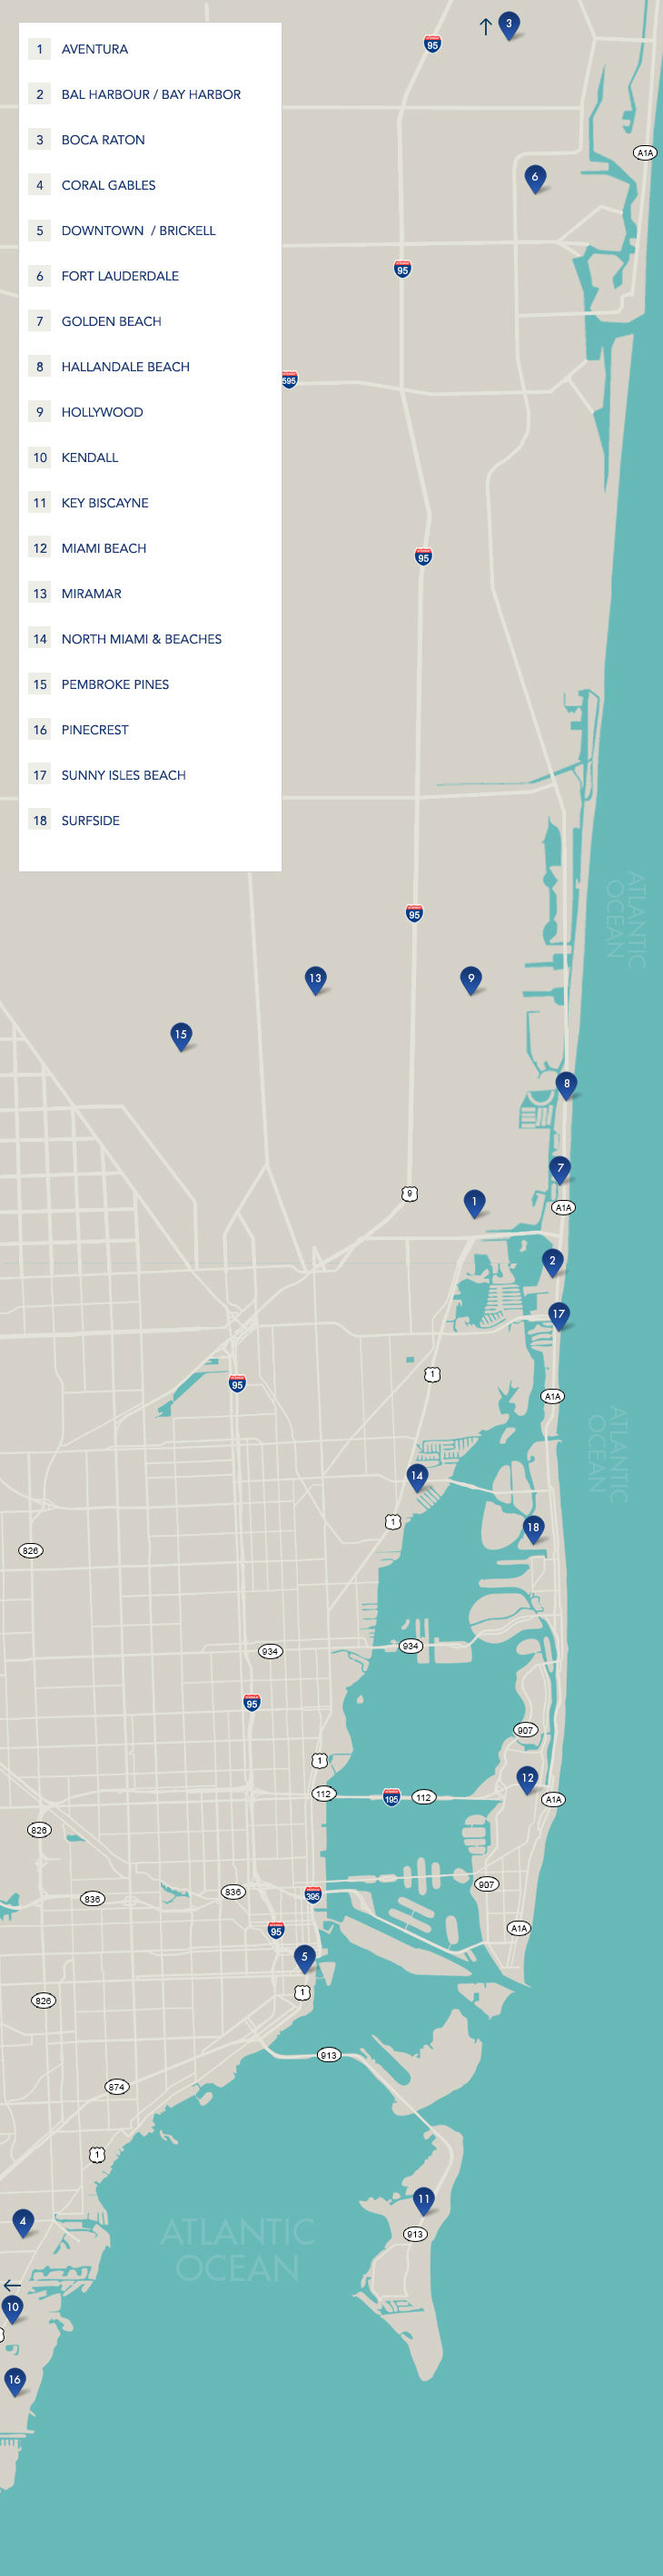 South Florida Neighborhoods | Map Of South Florida - South Beach Florida Map